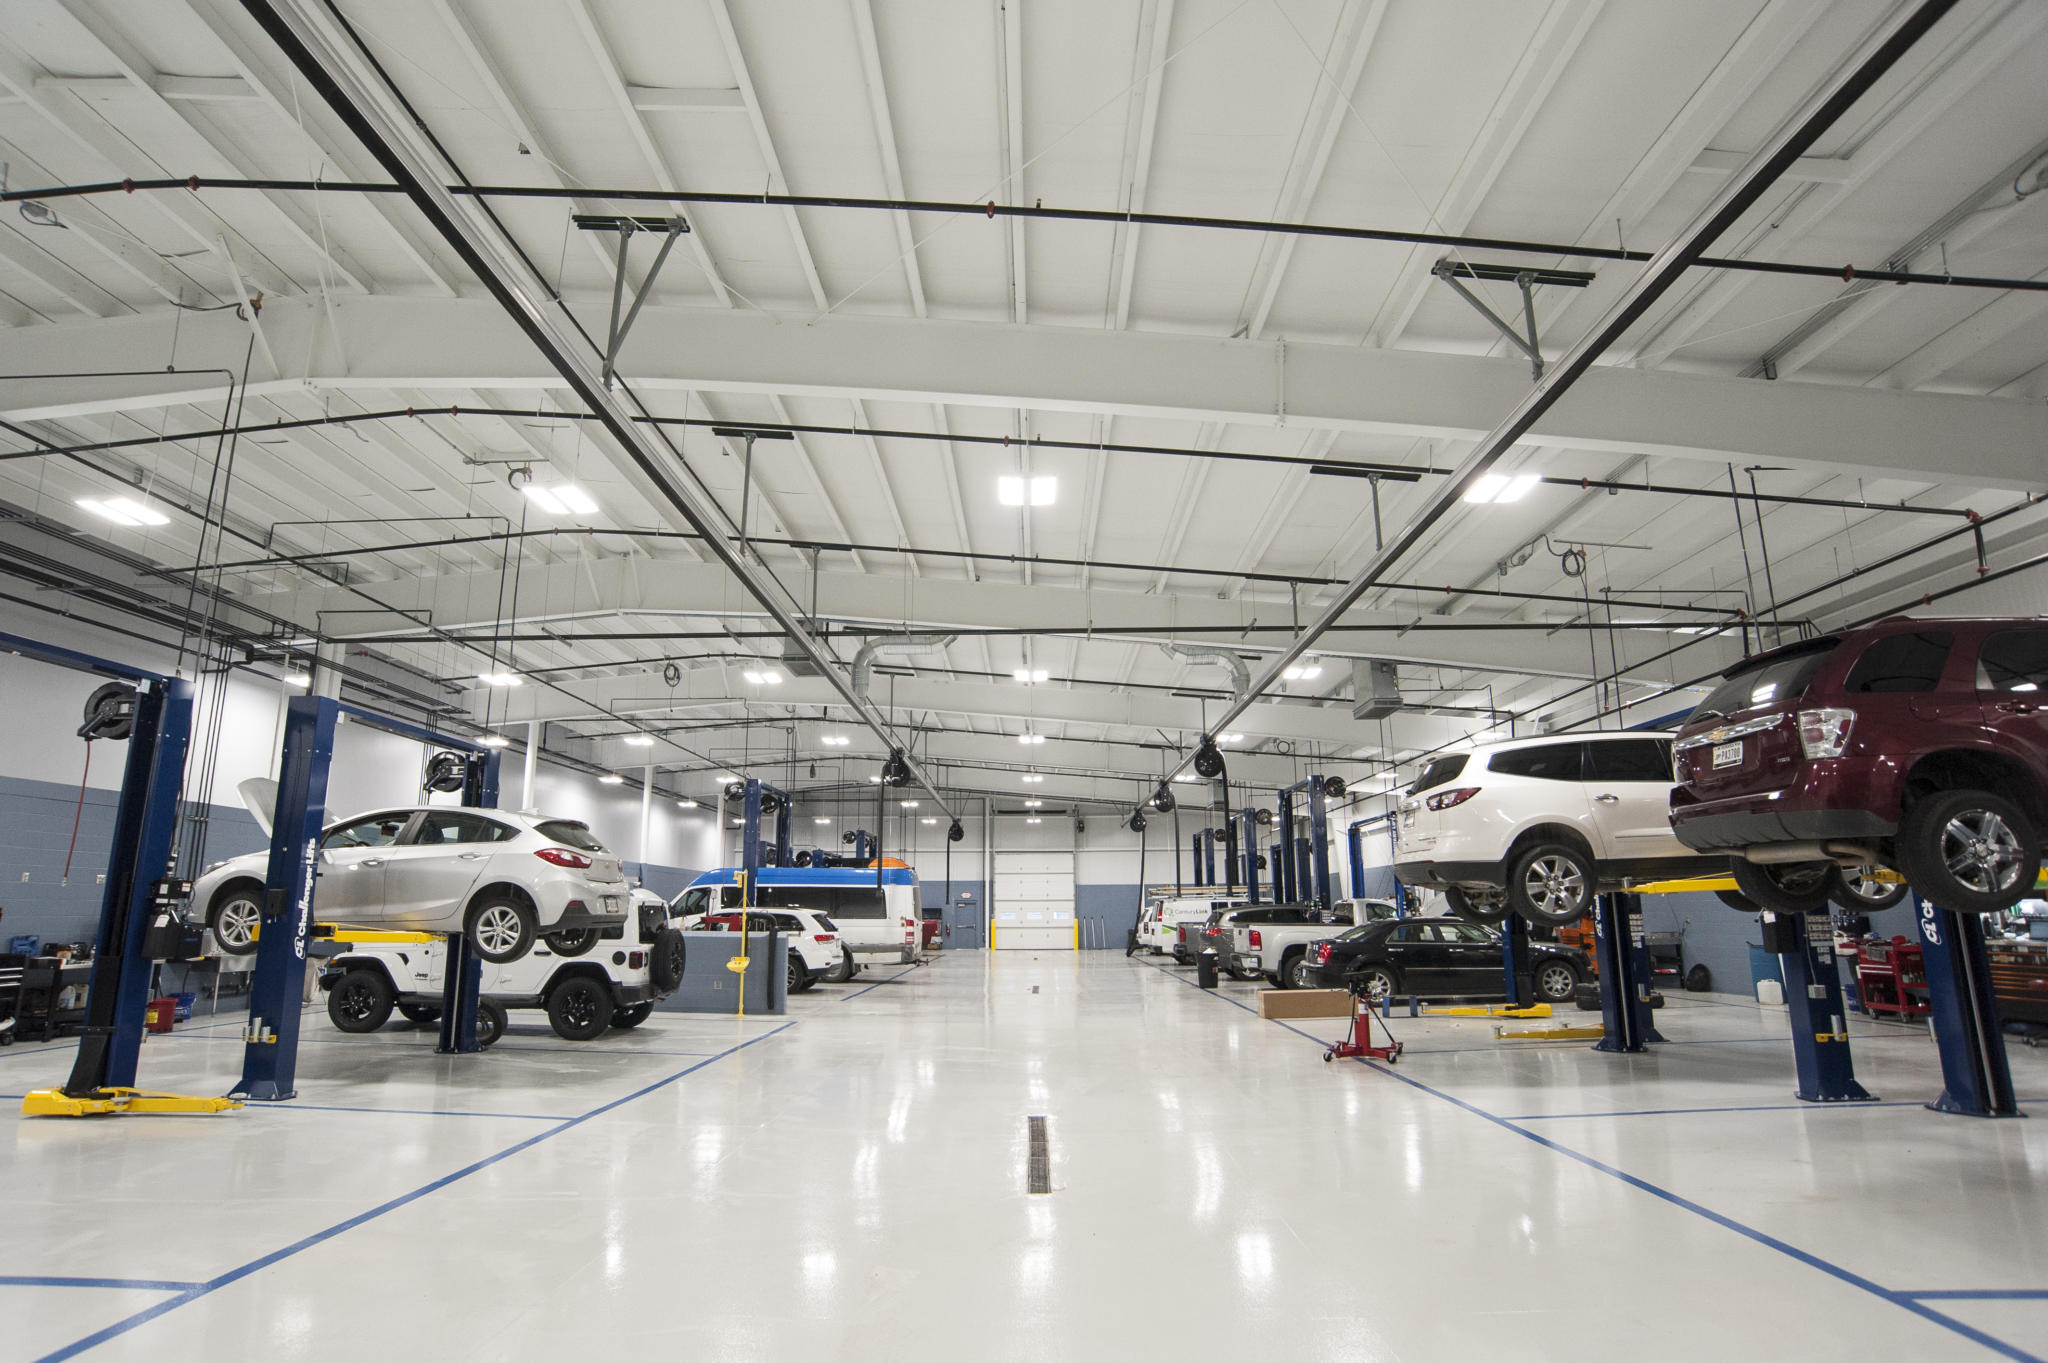 image of inside auto repair shop